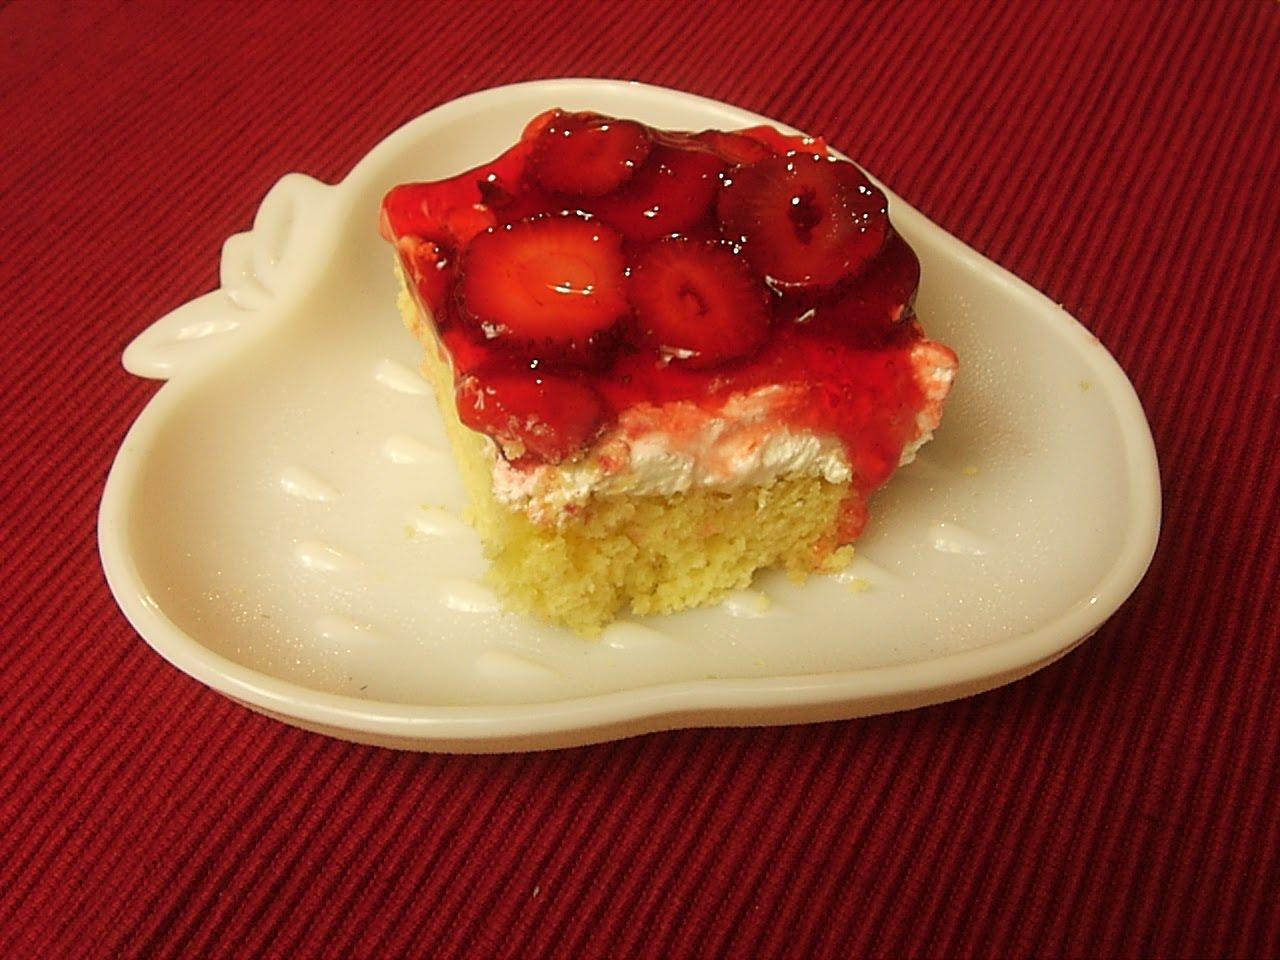 Layered Dessert Recipes With Cake Mix: Stirring It Up With Pam: Strawberry Layered Dessert